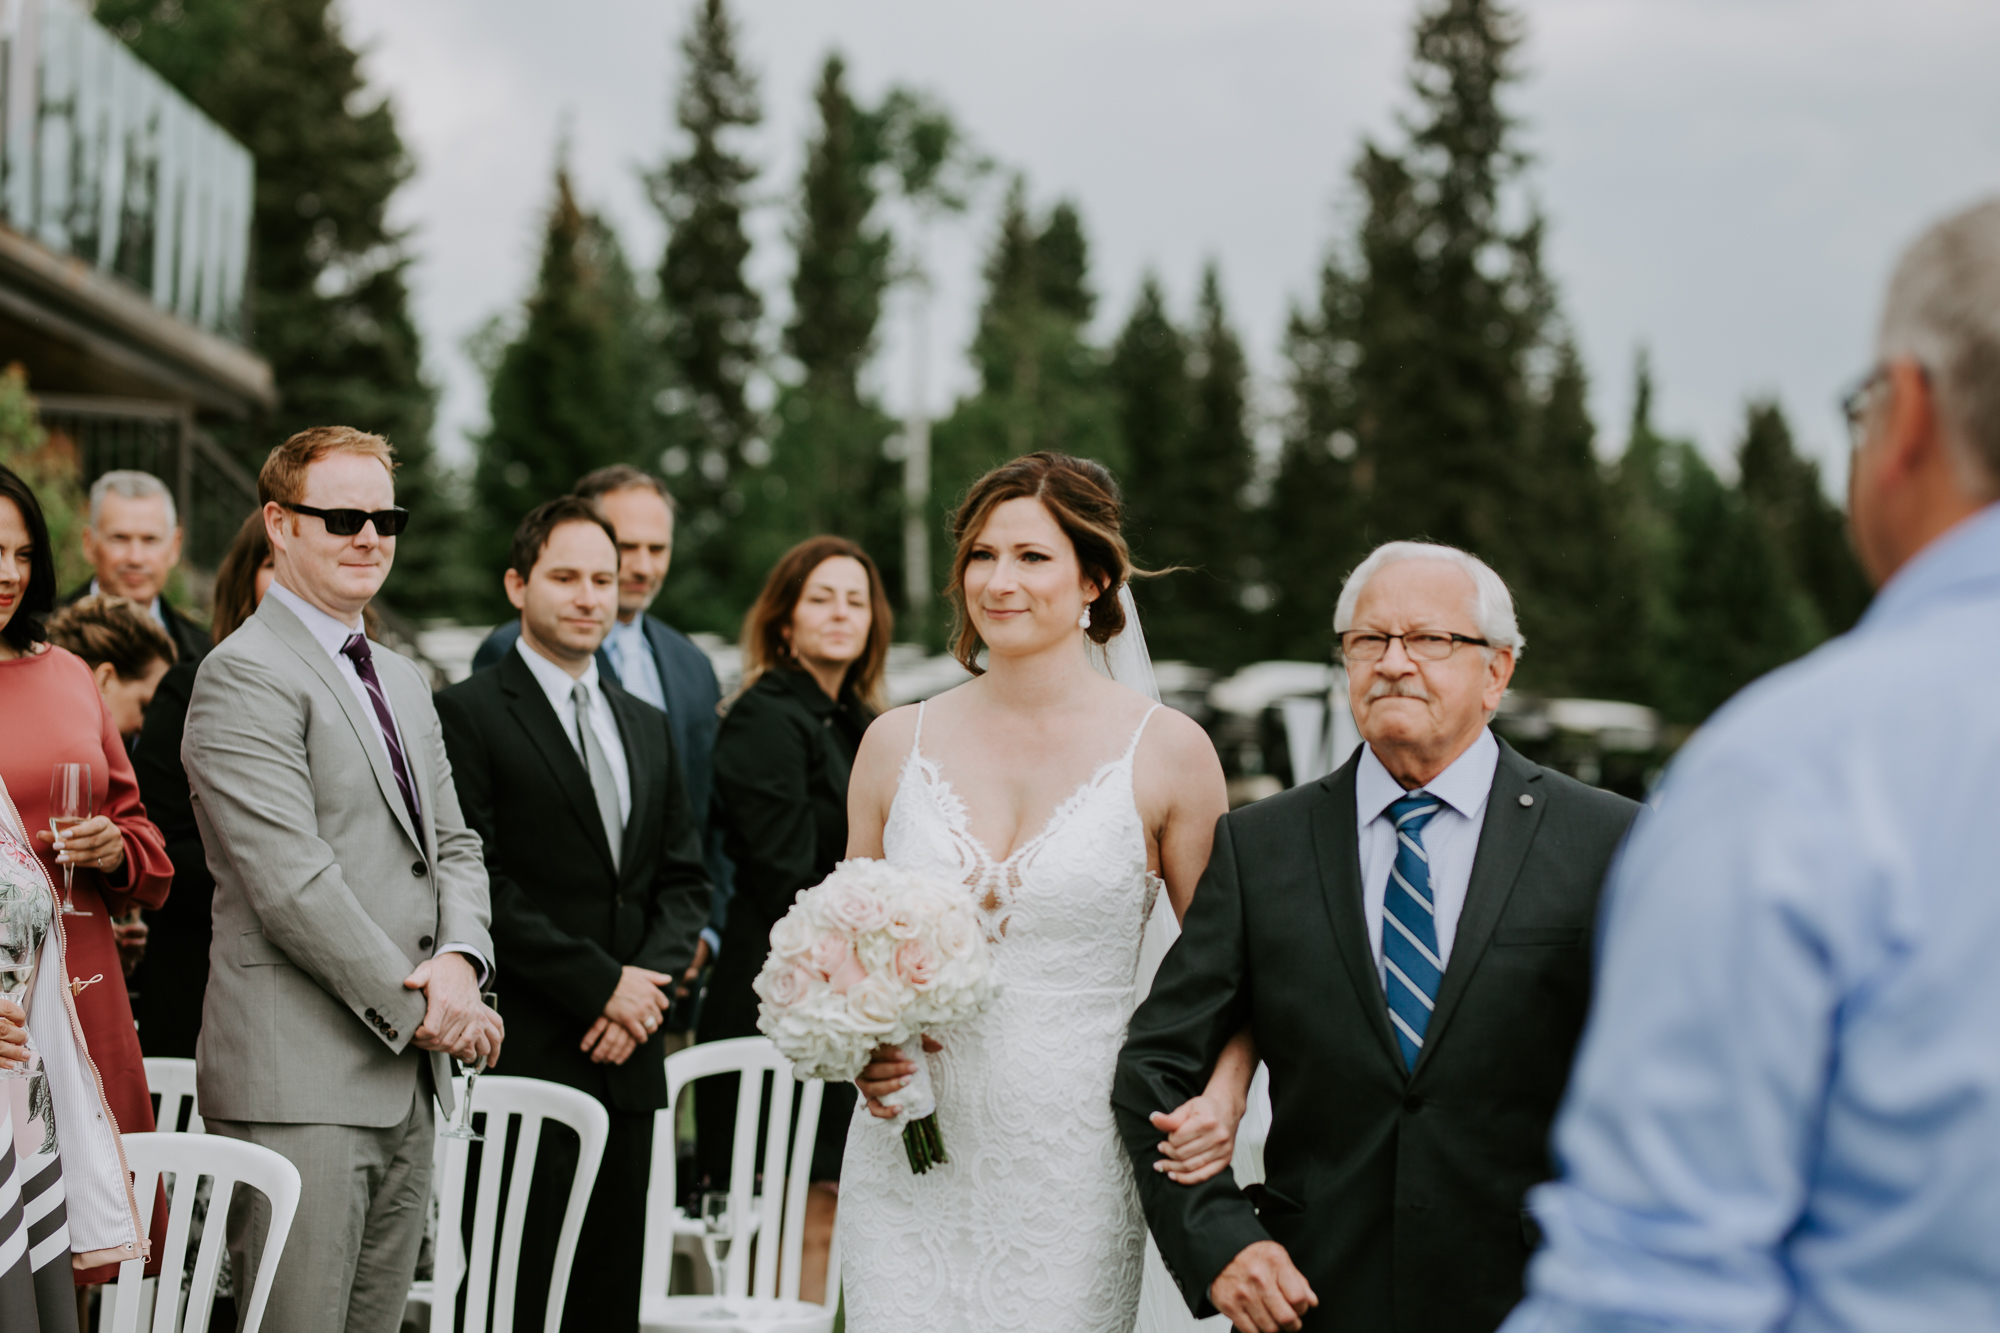 Priddis-Wedding-Photographer-JG-20.jpg